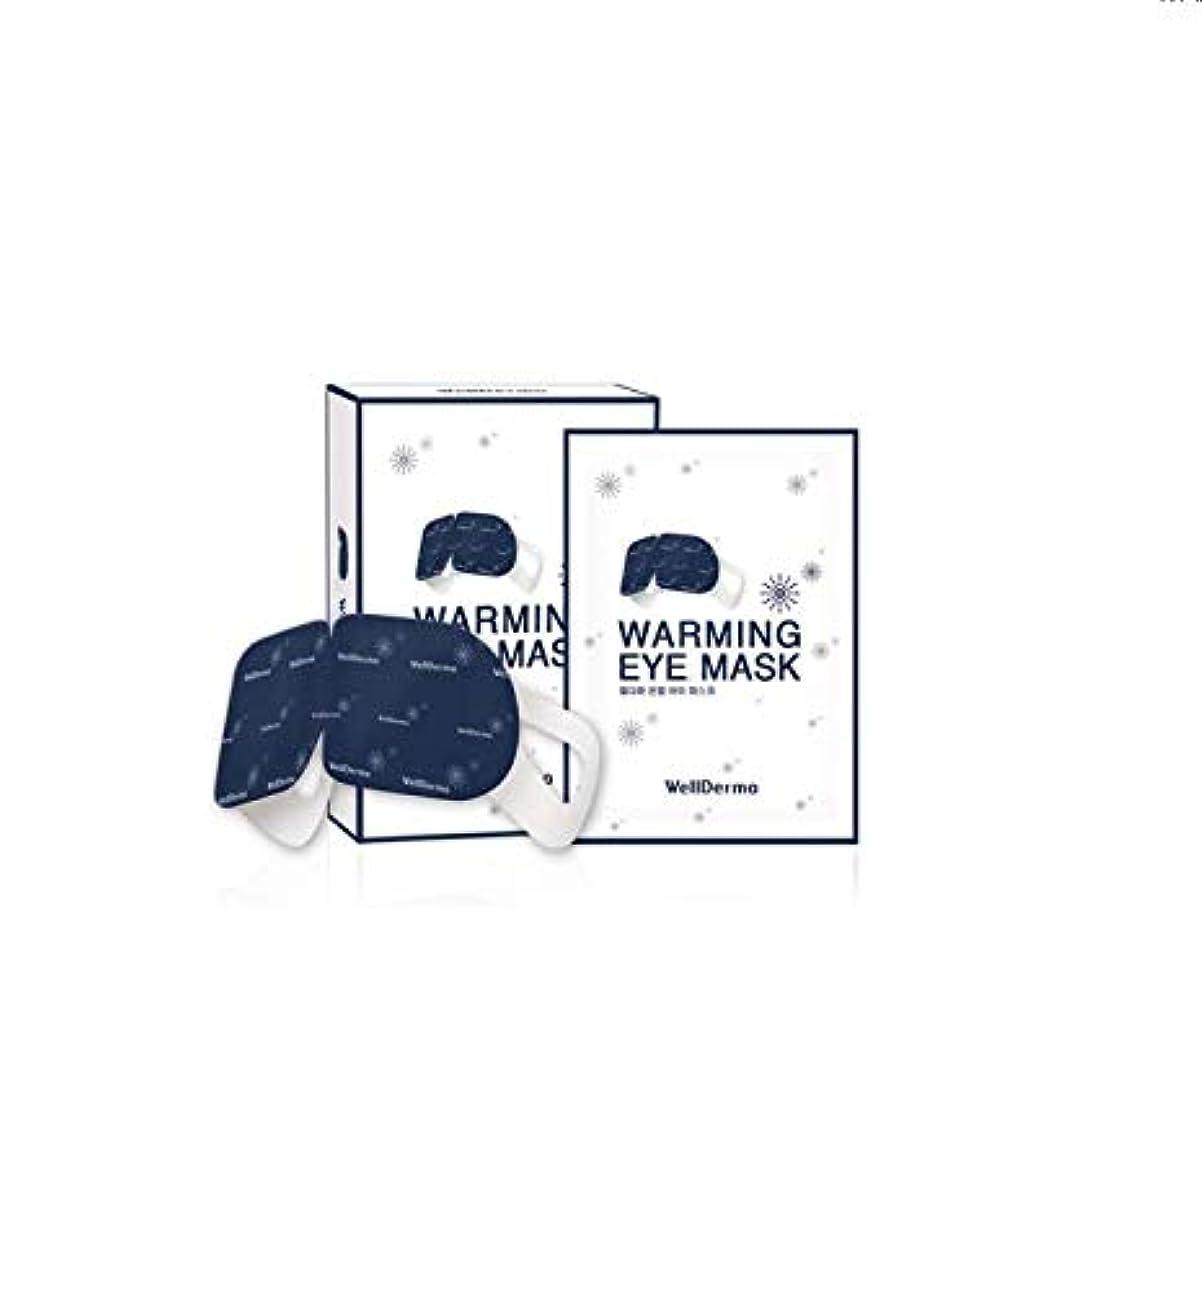 Wellderma (ウェルダーマ) ウォーミング アイ マスク パック/Warming Eye Mask 1pack(10sheets) [並行輸入品]